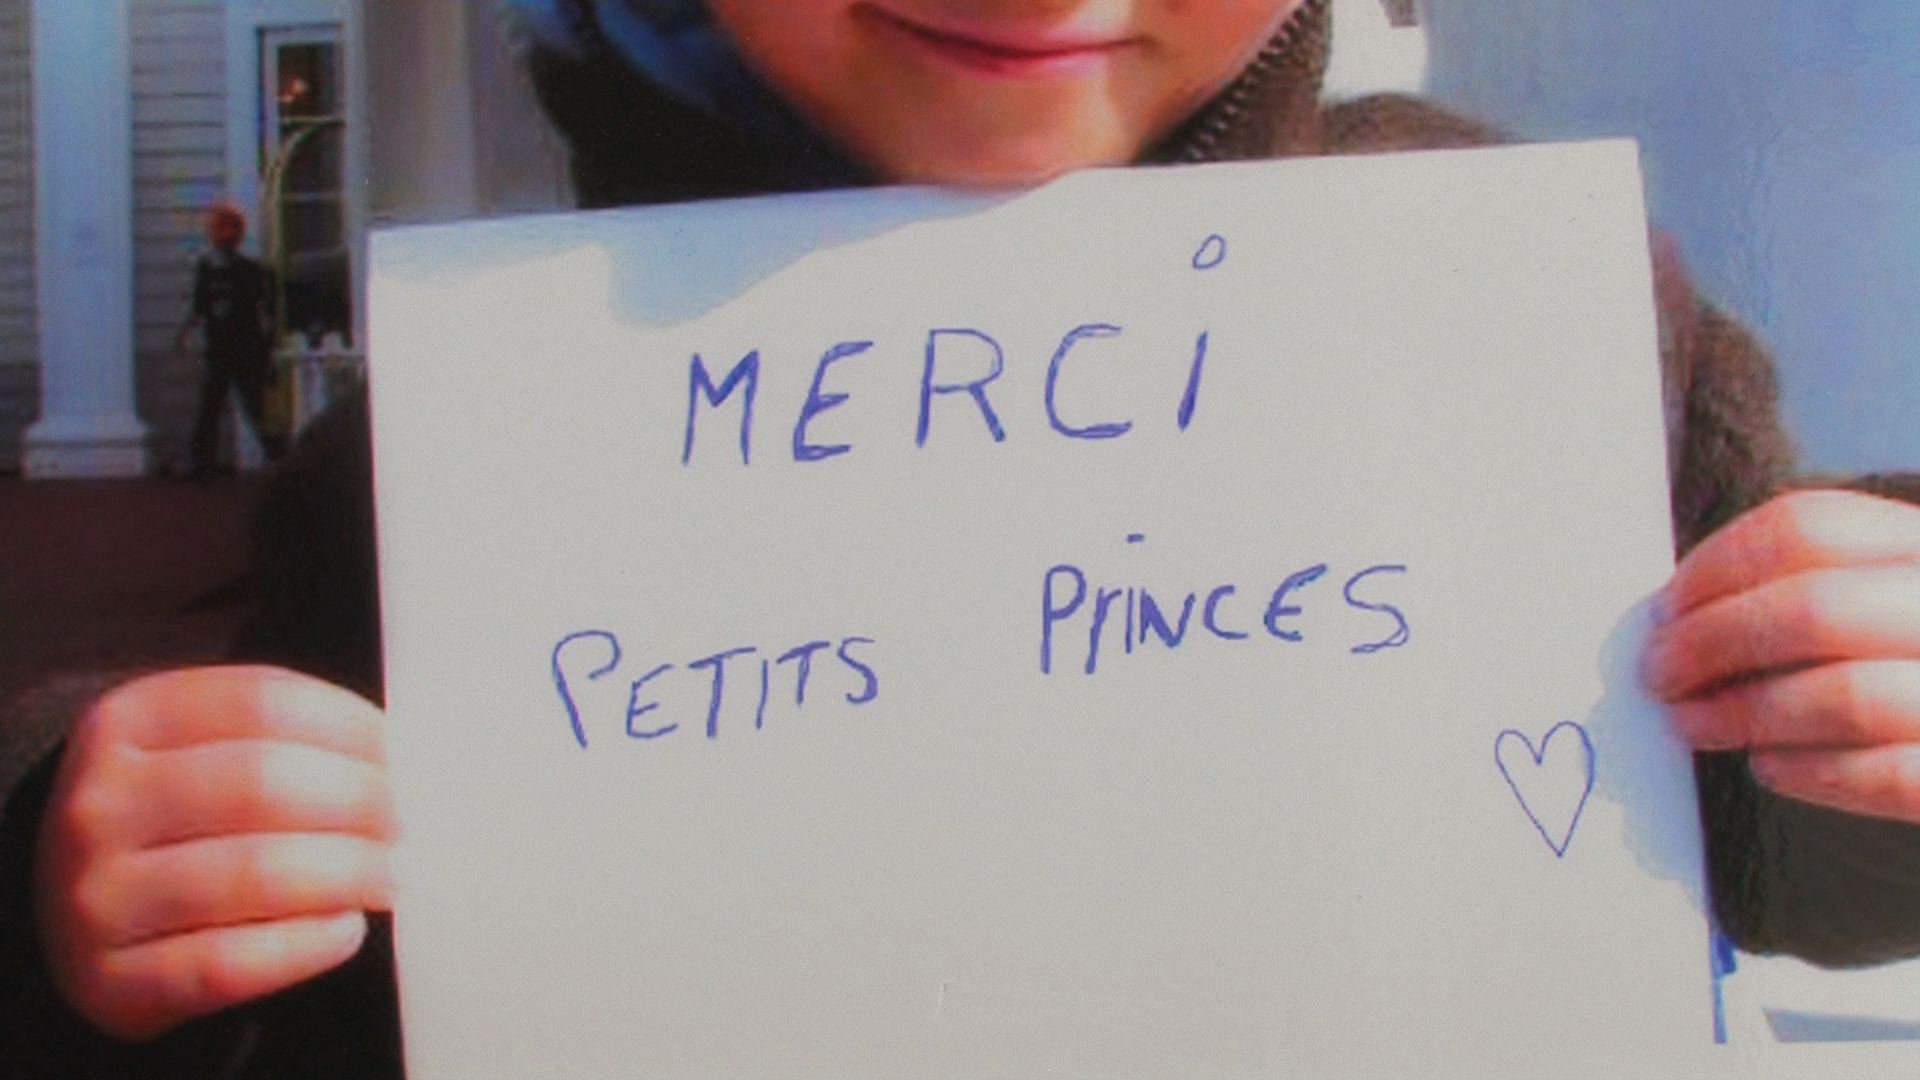 Merci Petits Princes